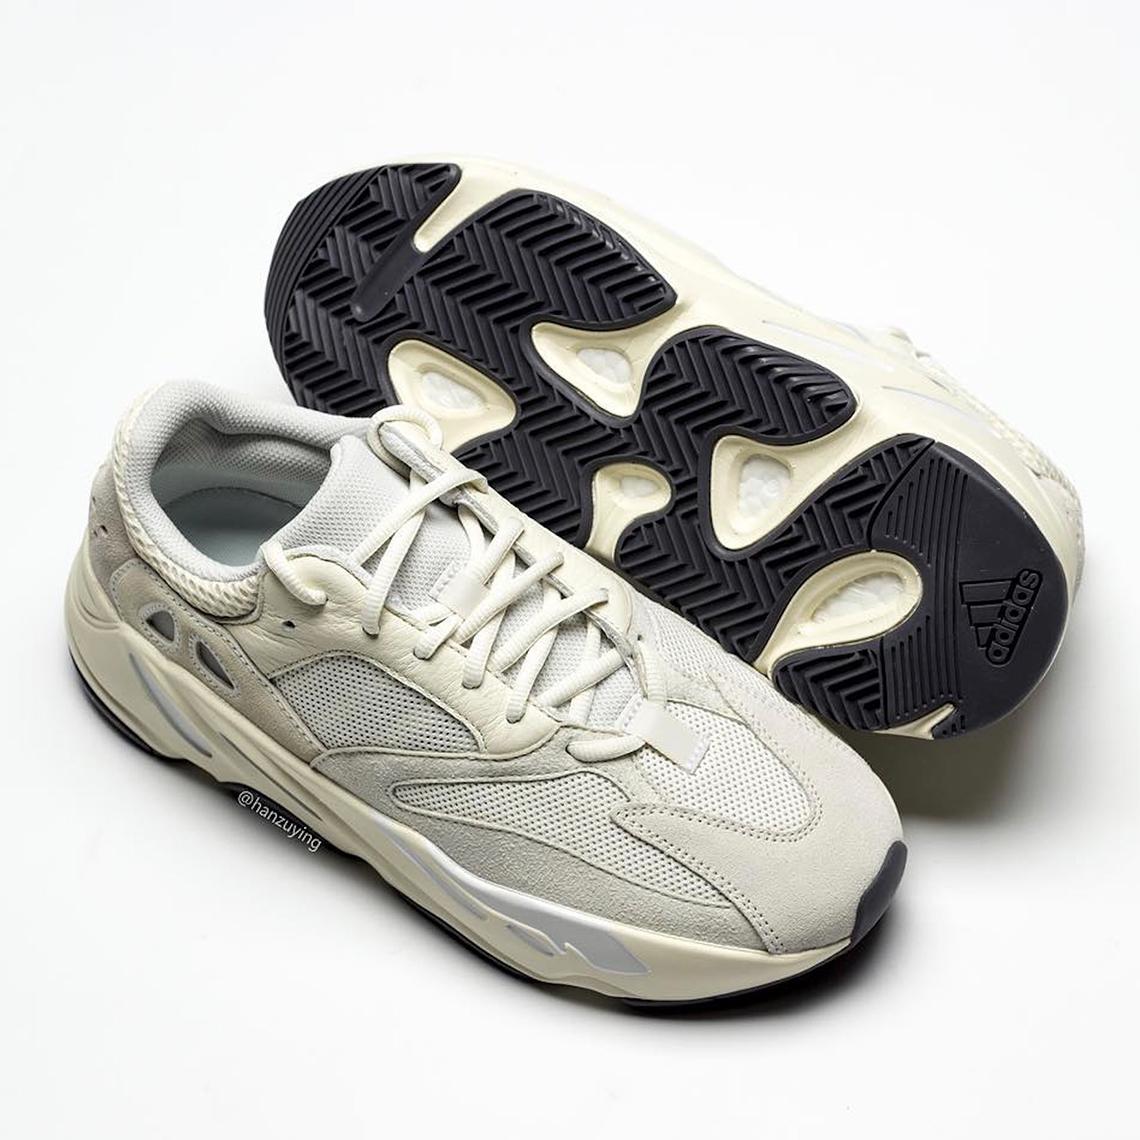 best website bf8b2 c4e77 adidas Yeezy Boost 700 Analog EG7596 Release Info   SneakerNews.com